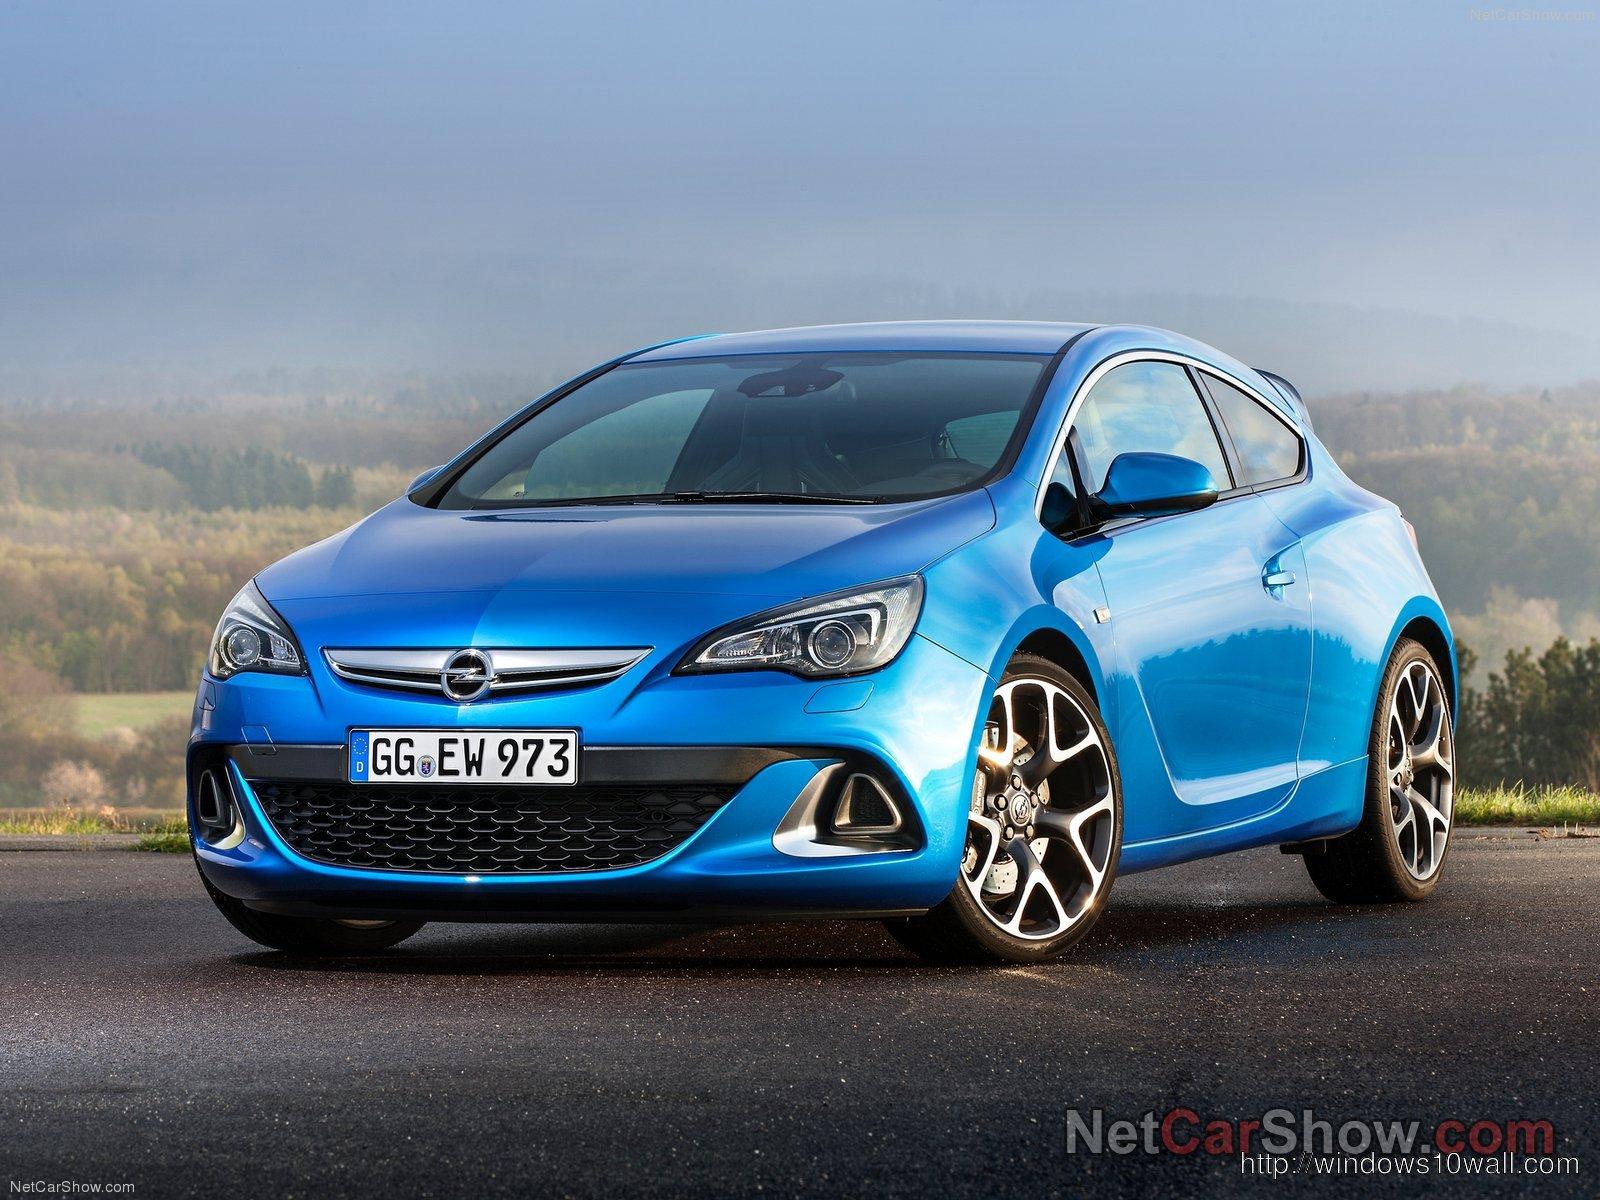 Opel Astra Opc 2013 Desktop Background Wallpaper Windows 10 Wallpapers